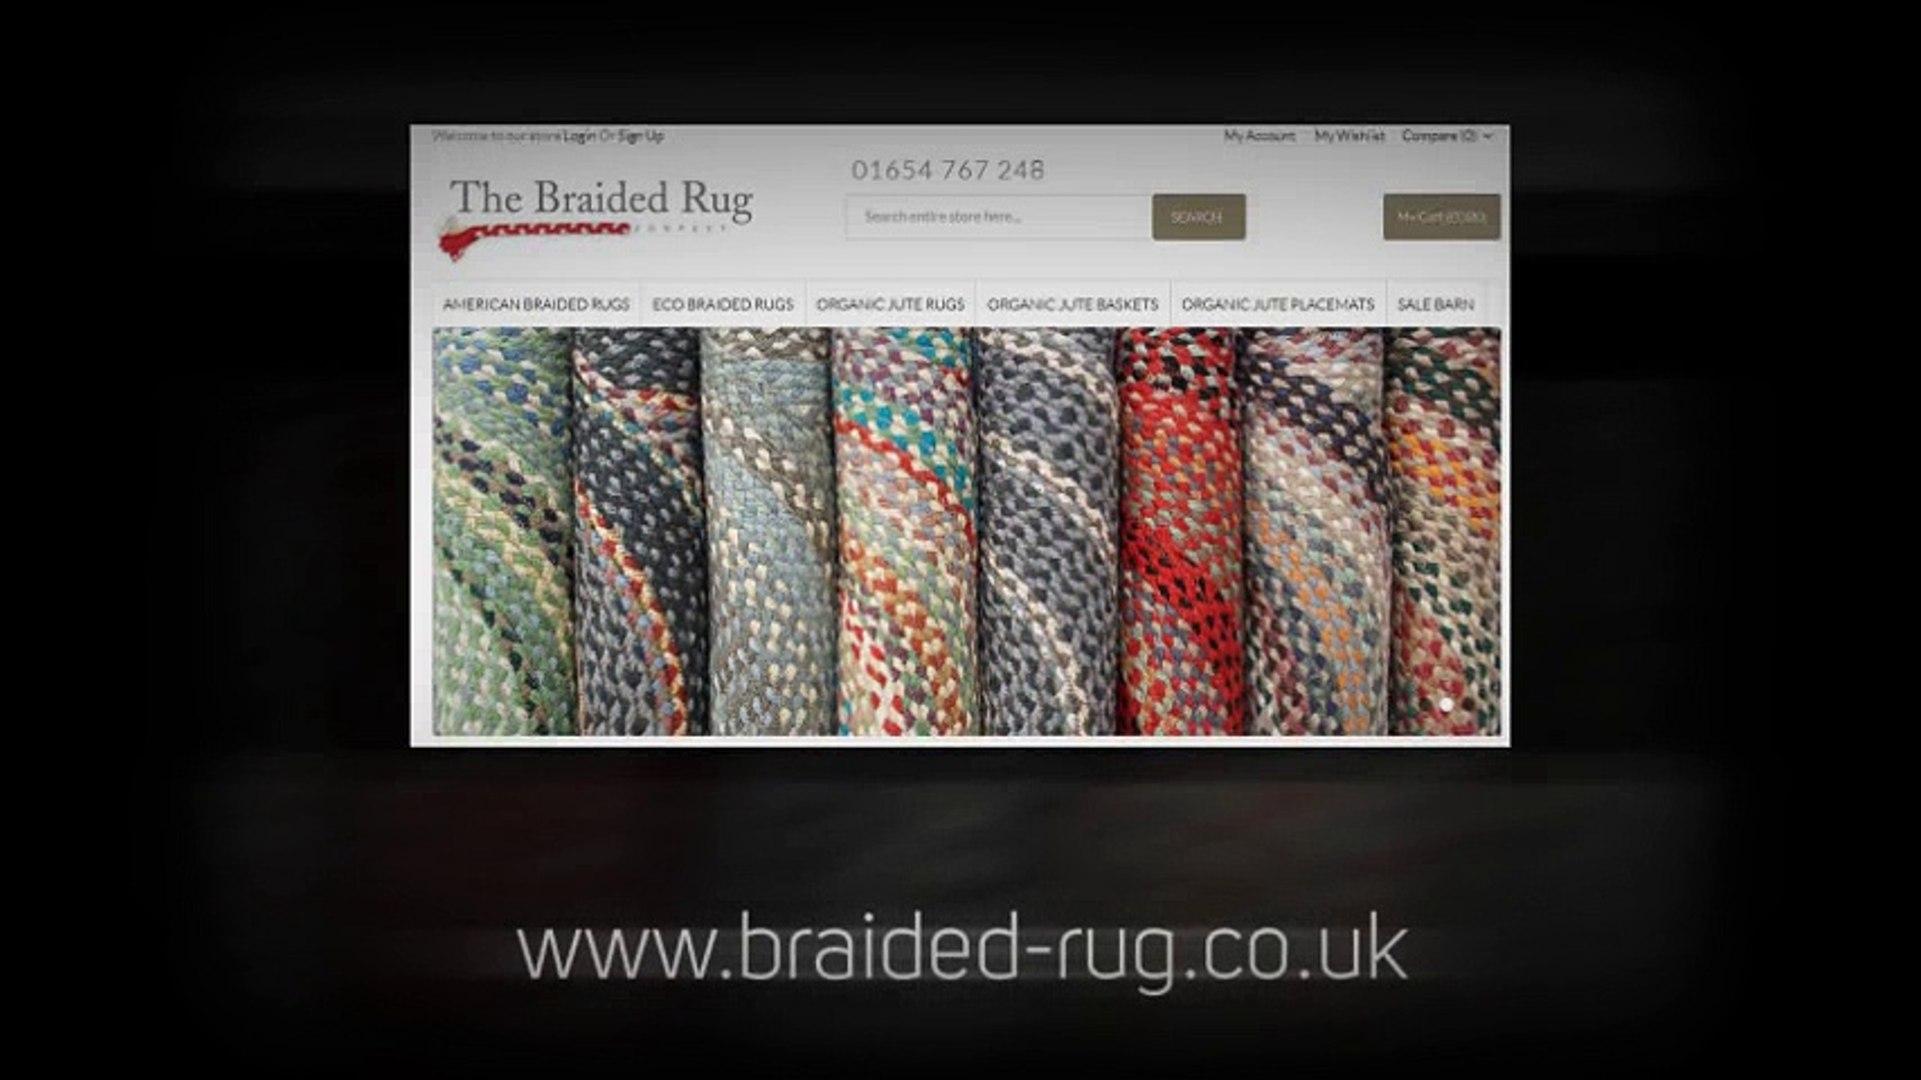 The Braided Rug Company High Quality